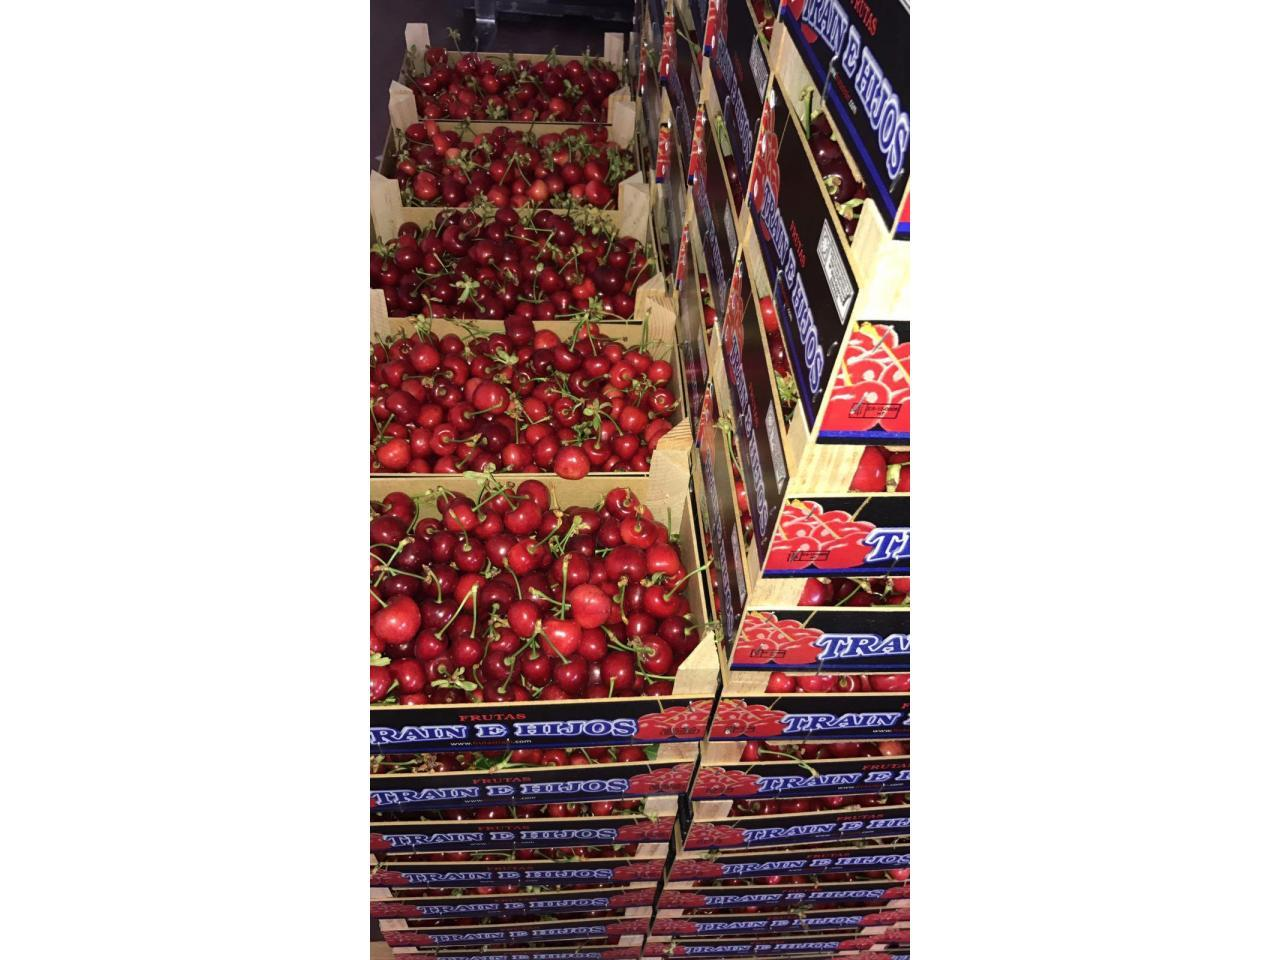 Продаем черешню из Испании - 4